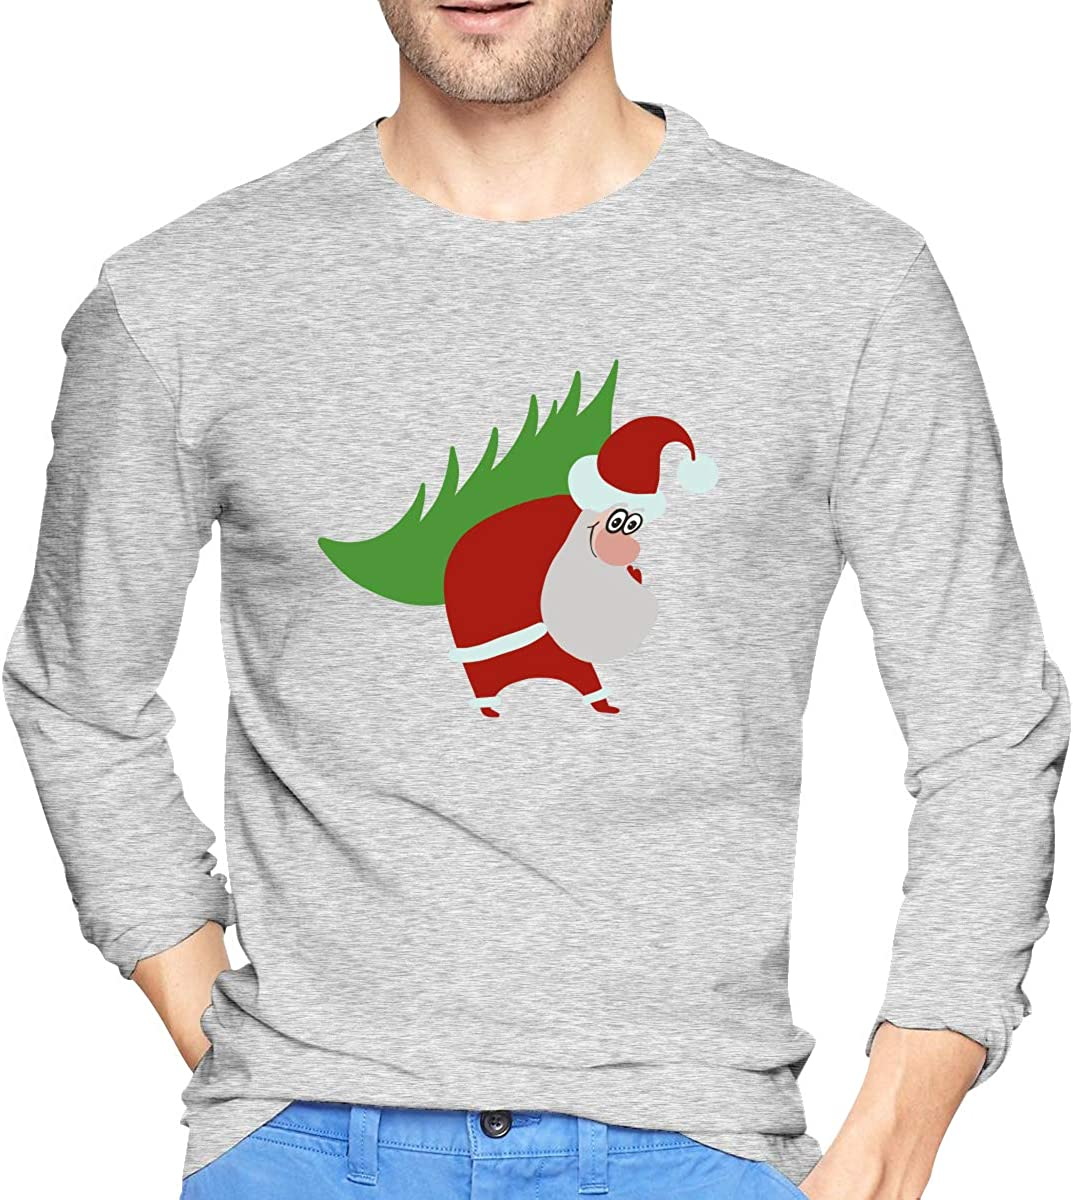 LONGTENG Customized Santa Claus1 Fashion T Shirt O-Neck Pure Cotton for Man Black